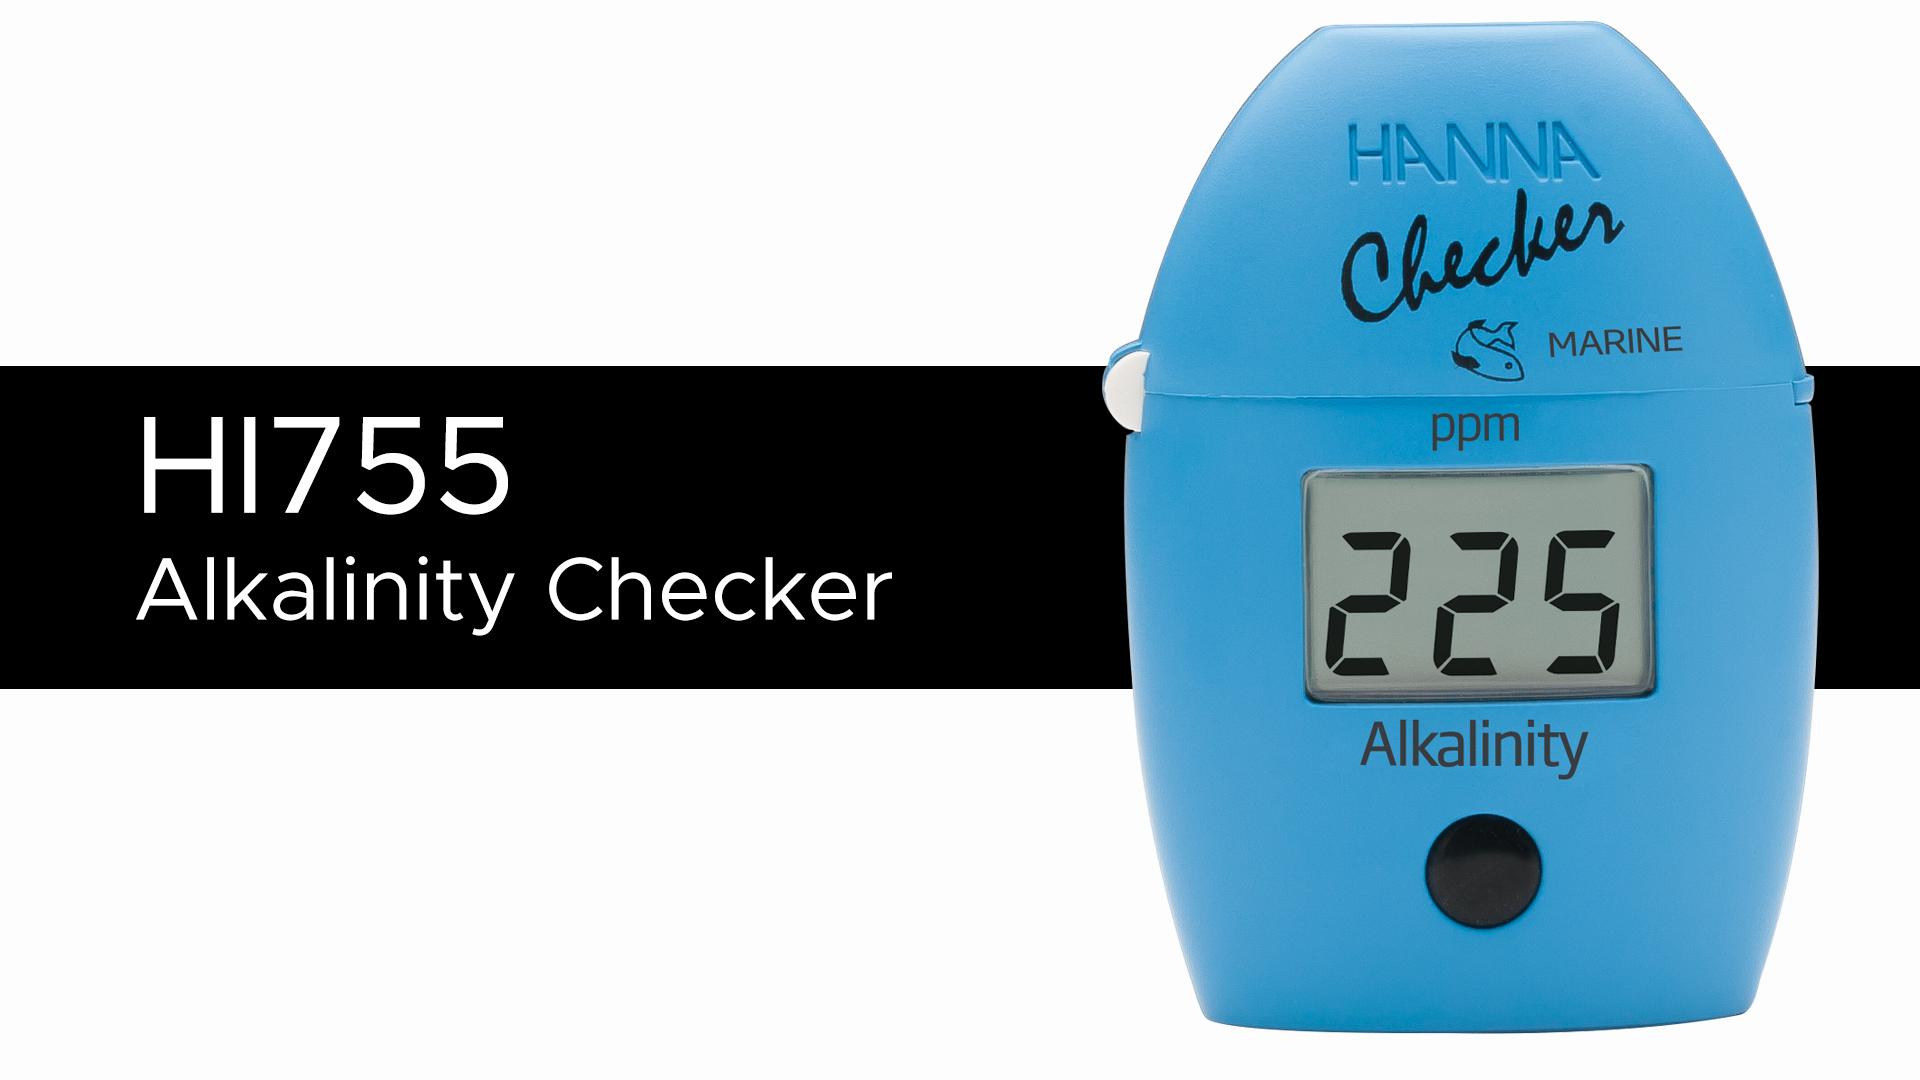 Hanna Marine ppm Alkalinity Checker® HC - HI755